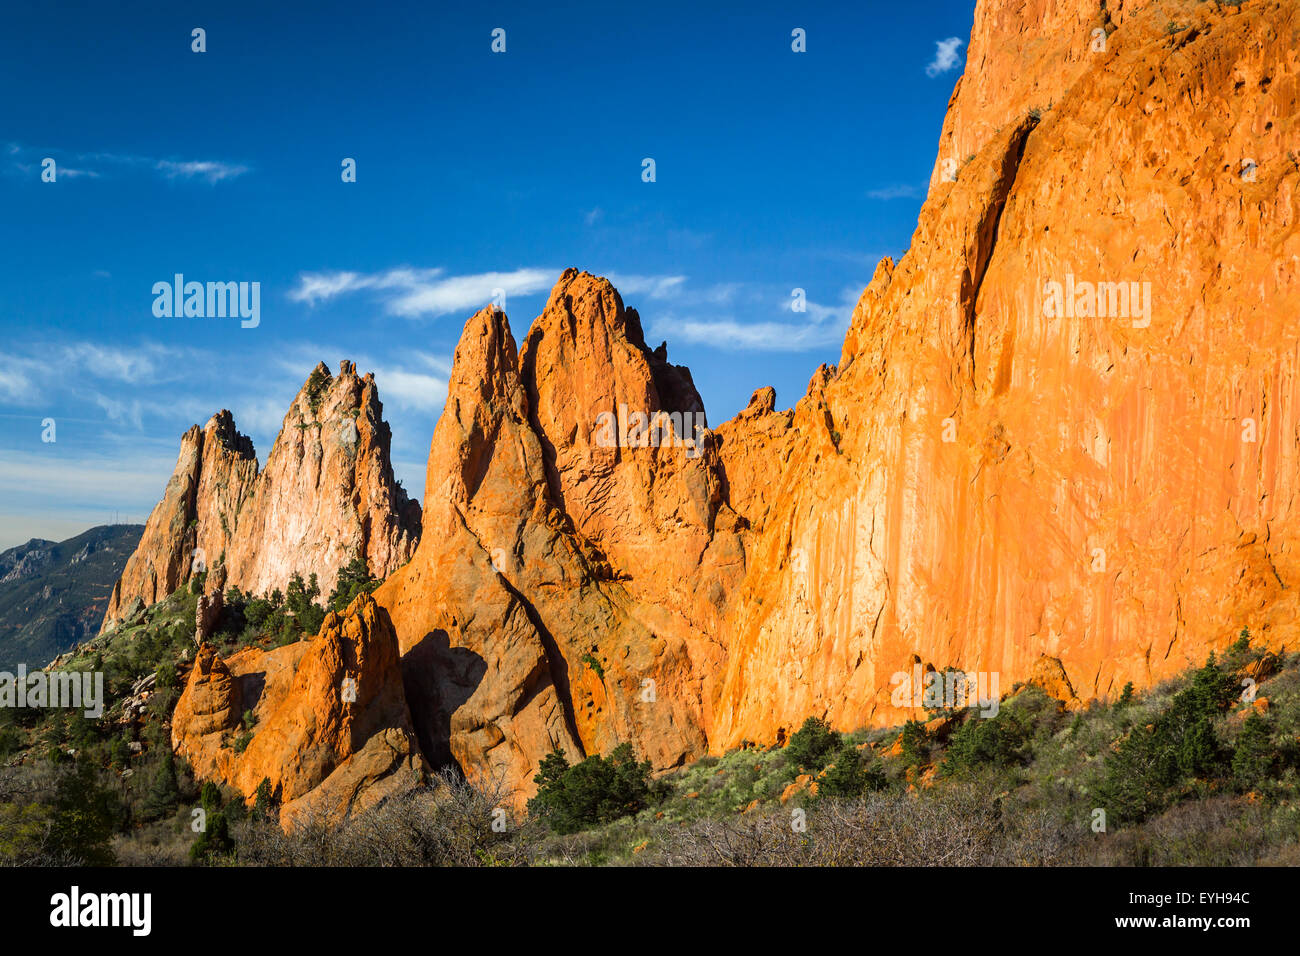 The rock formations in the Garden of the Gods National Natural Landmark near Colorado Springs, Colorado, USA. - Stock Image